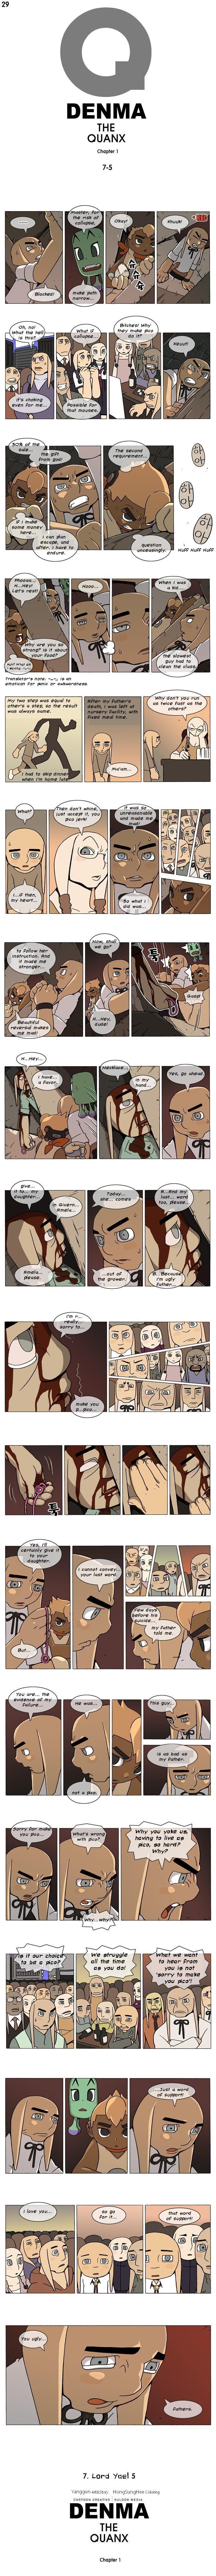 Denma 29 Page 1